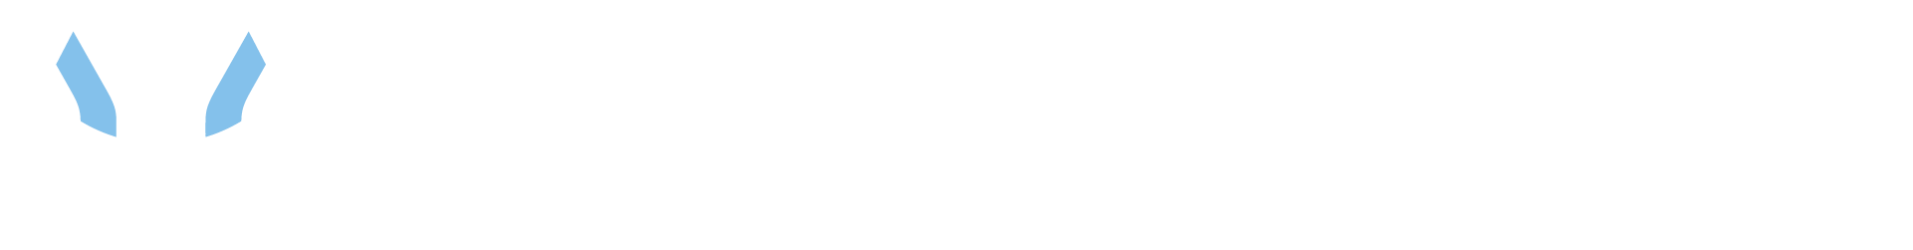 SIGLA_standard_color-negativ-orizontal ptr site taxeusv marita-01